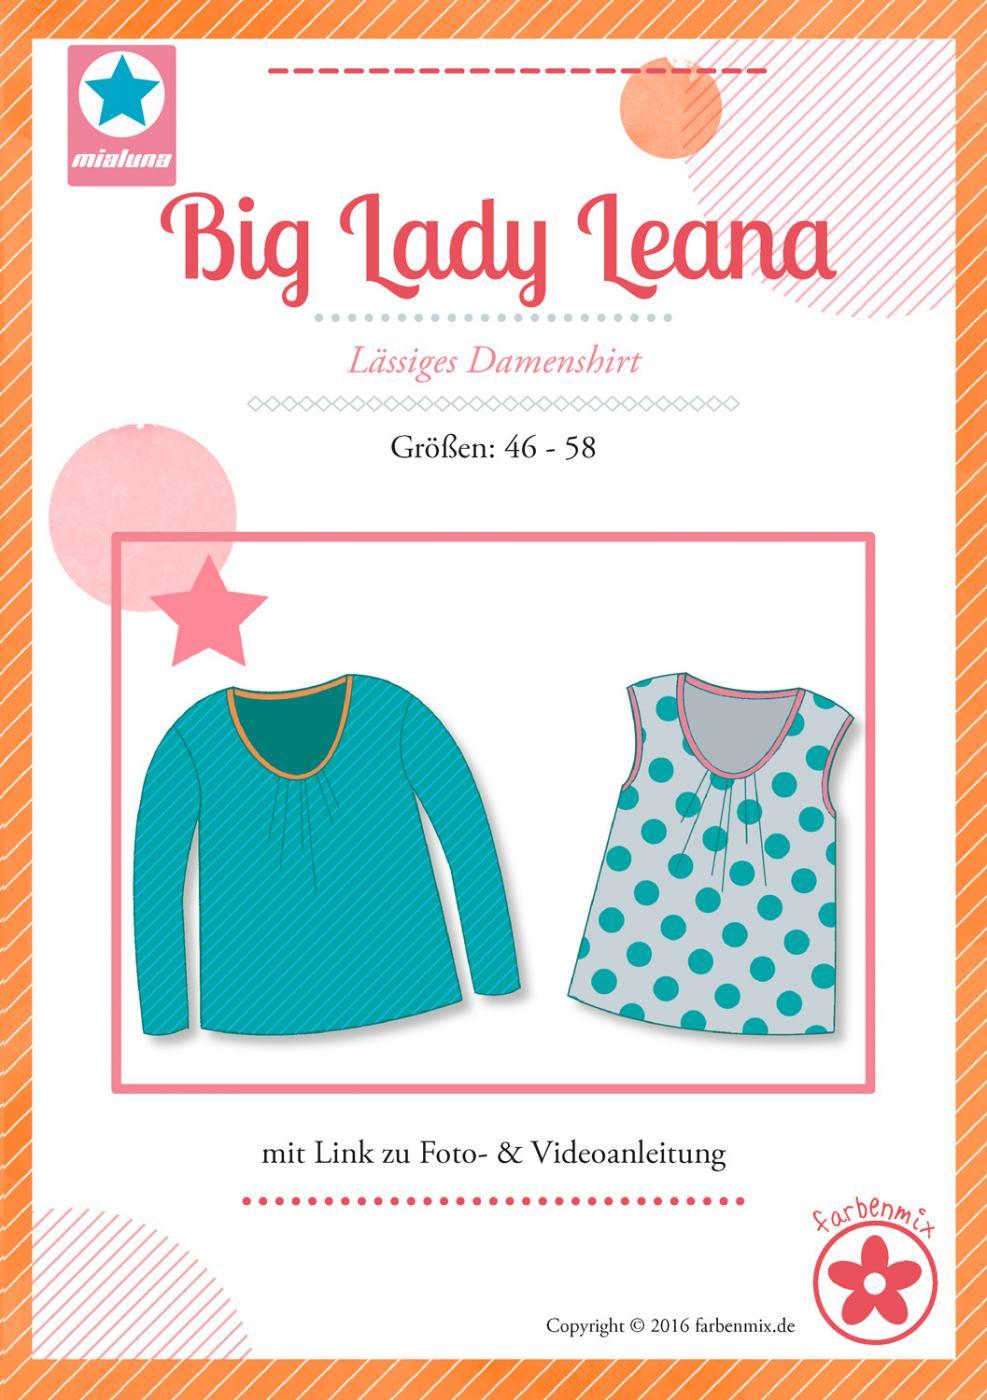 mialuna_cover_big_lady_leana